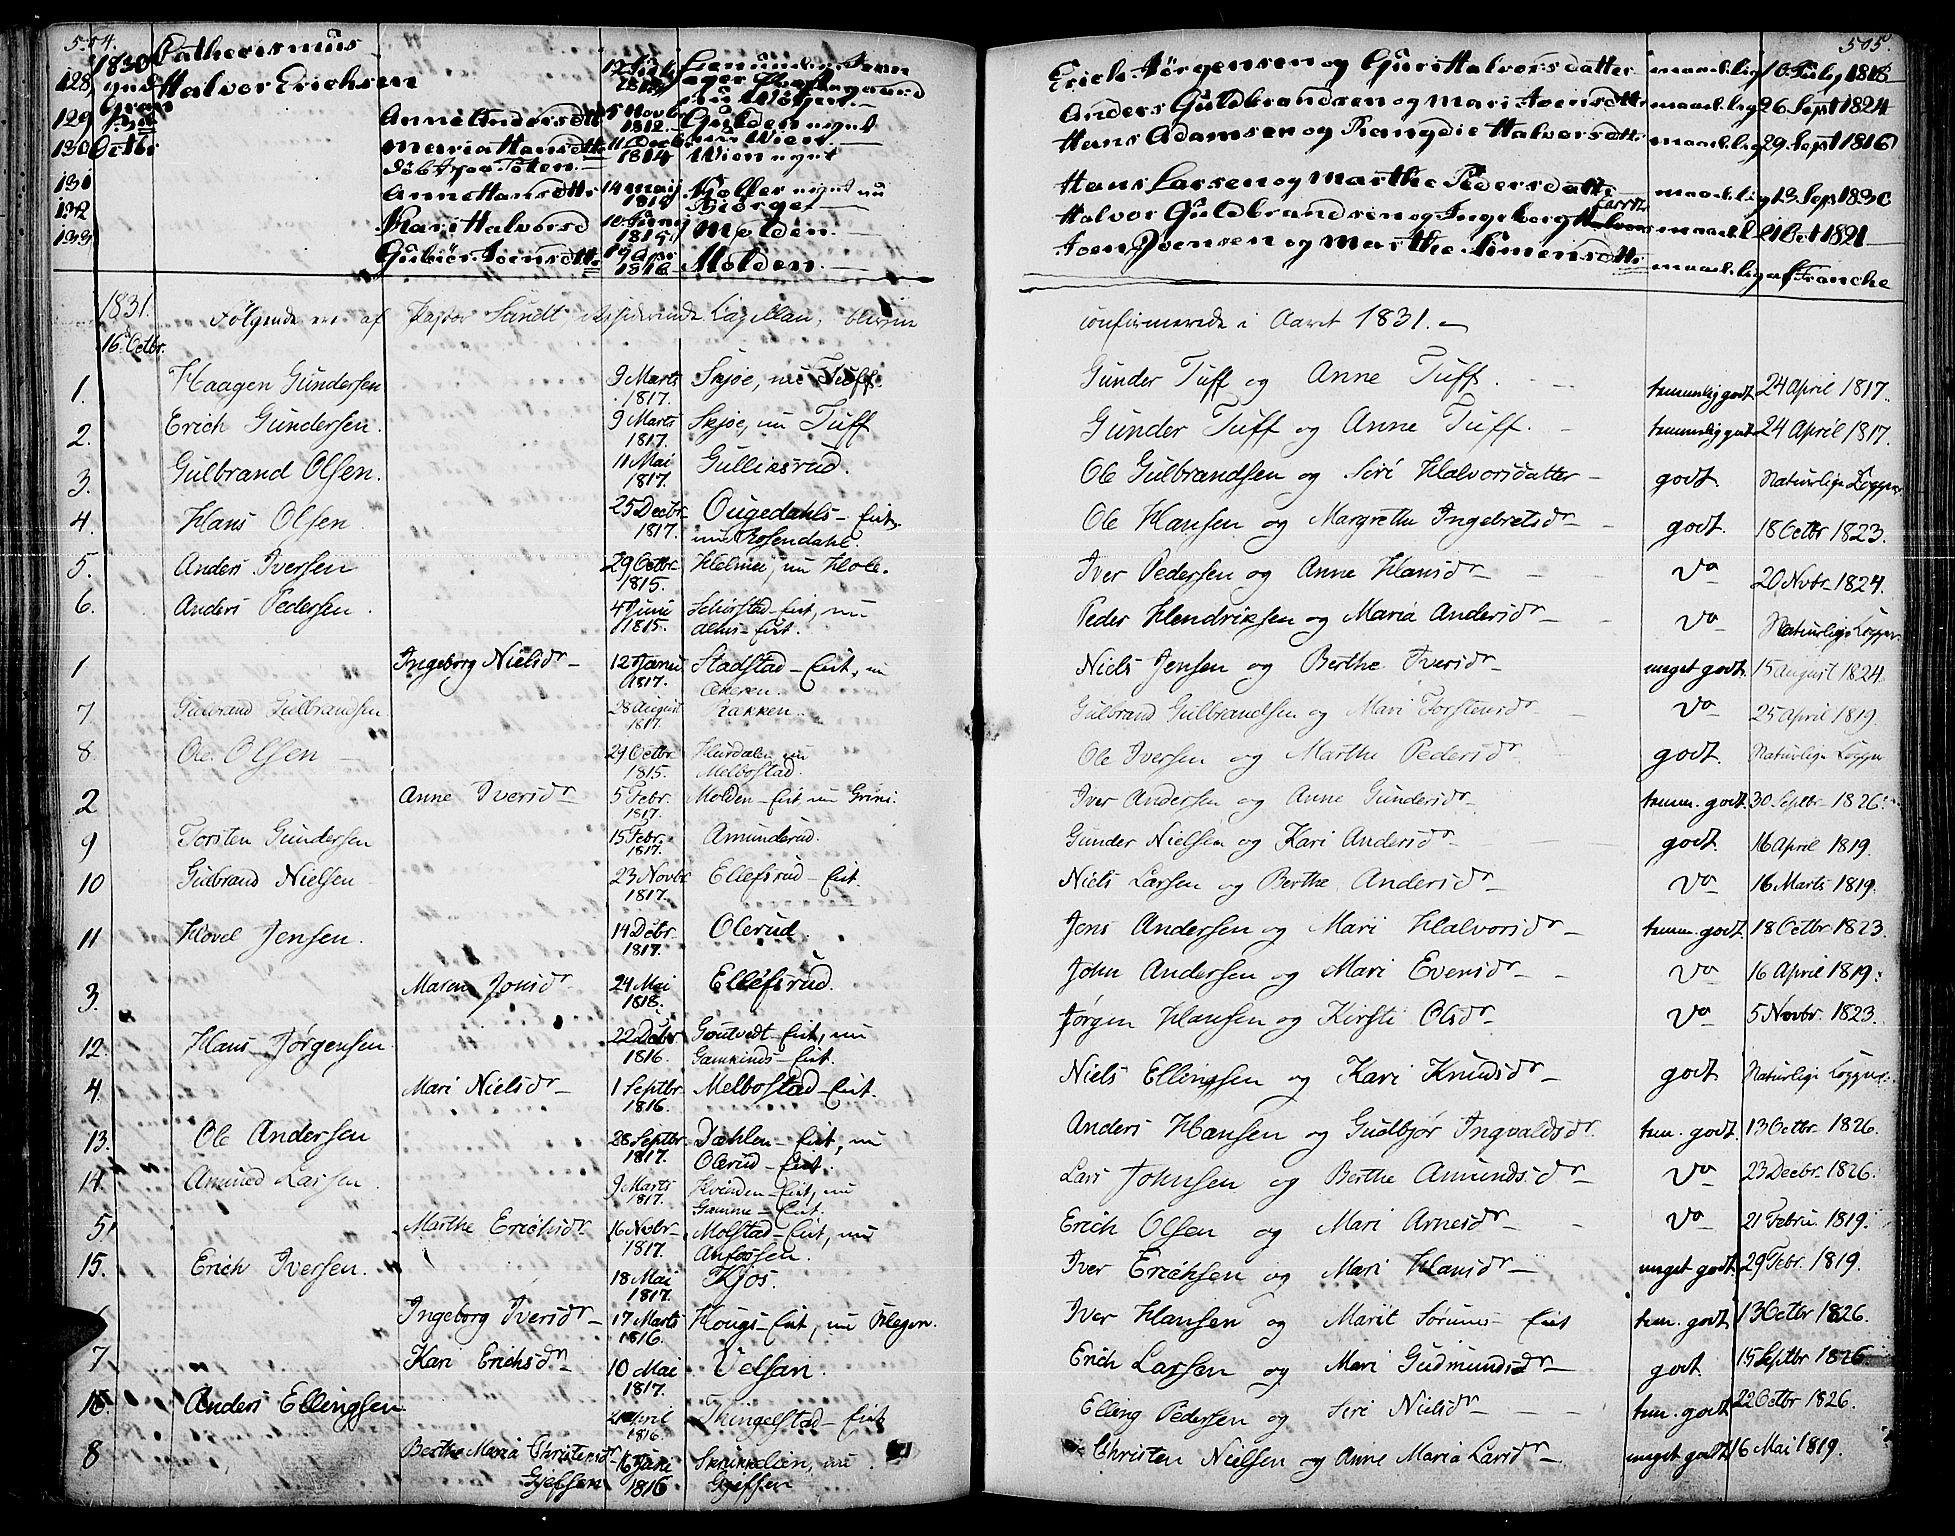 SAH, Gran prestekontor, Ministerialbok nr. 10, 1824-1842, s. 504-505